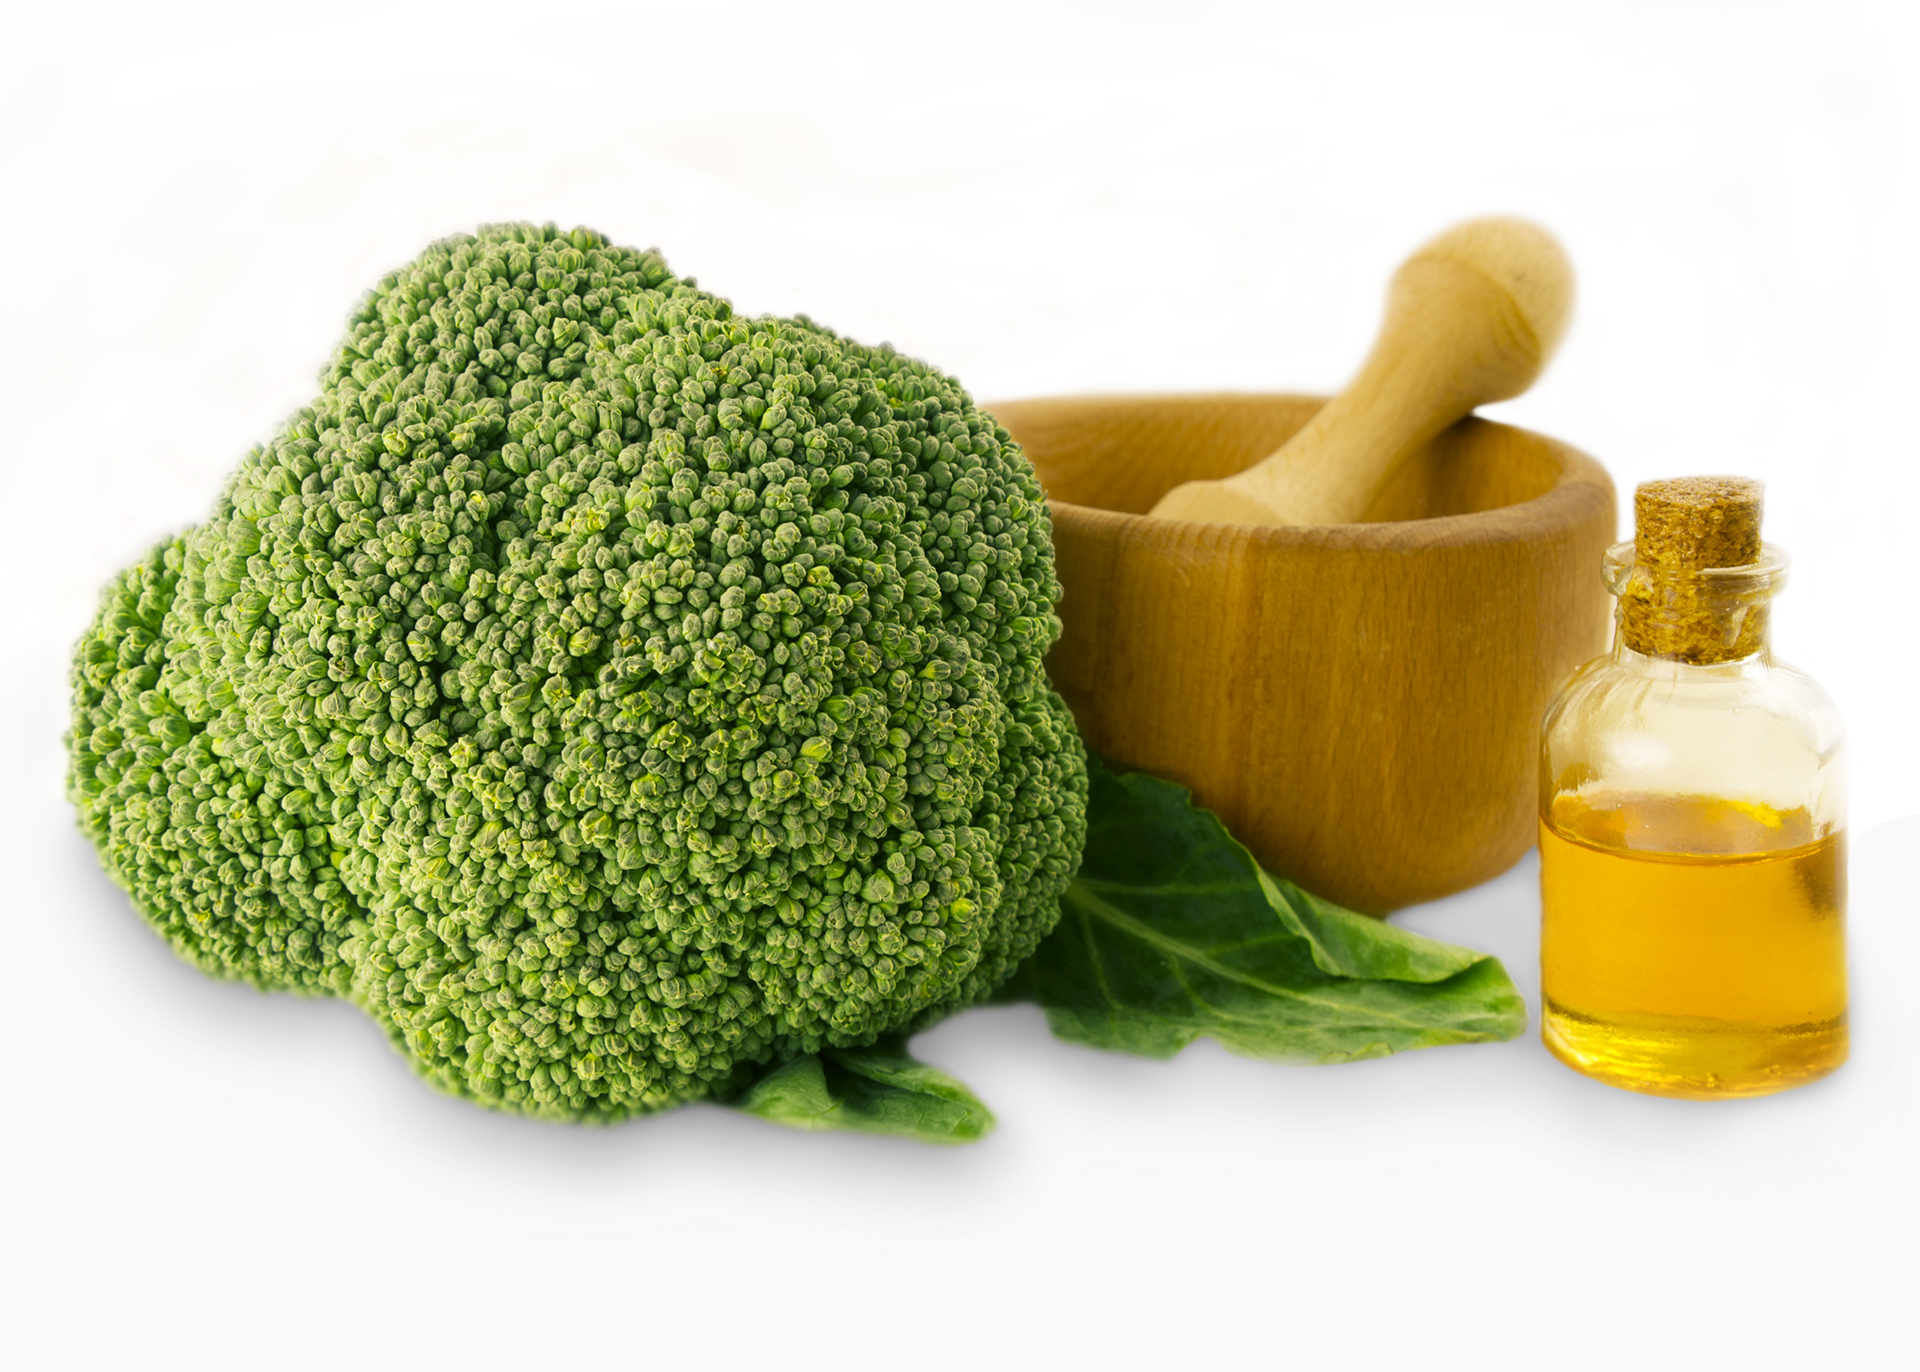 Broccoliseed-Oil_Henry-Lamotte-Oils